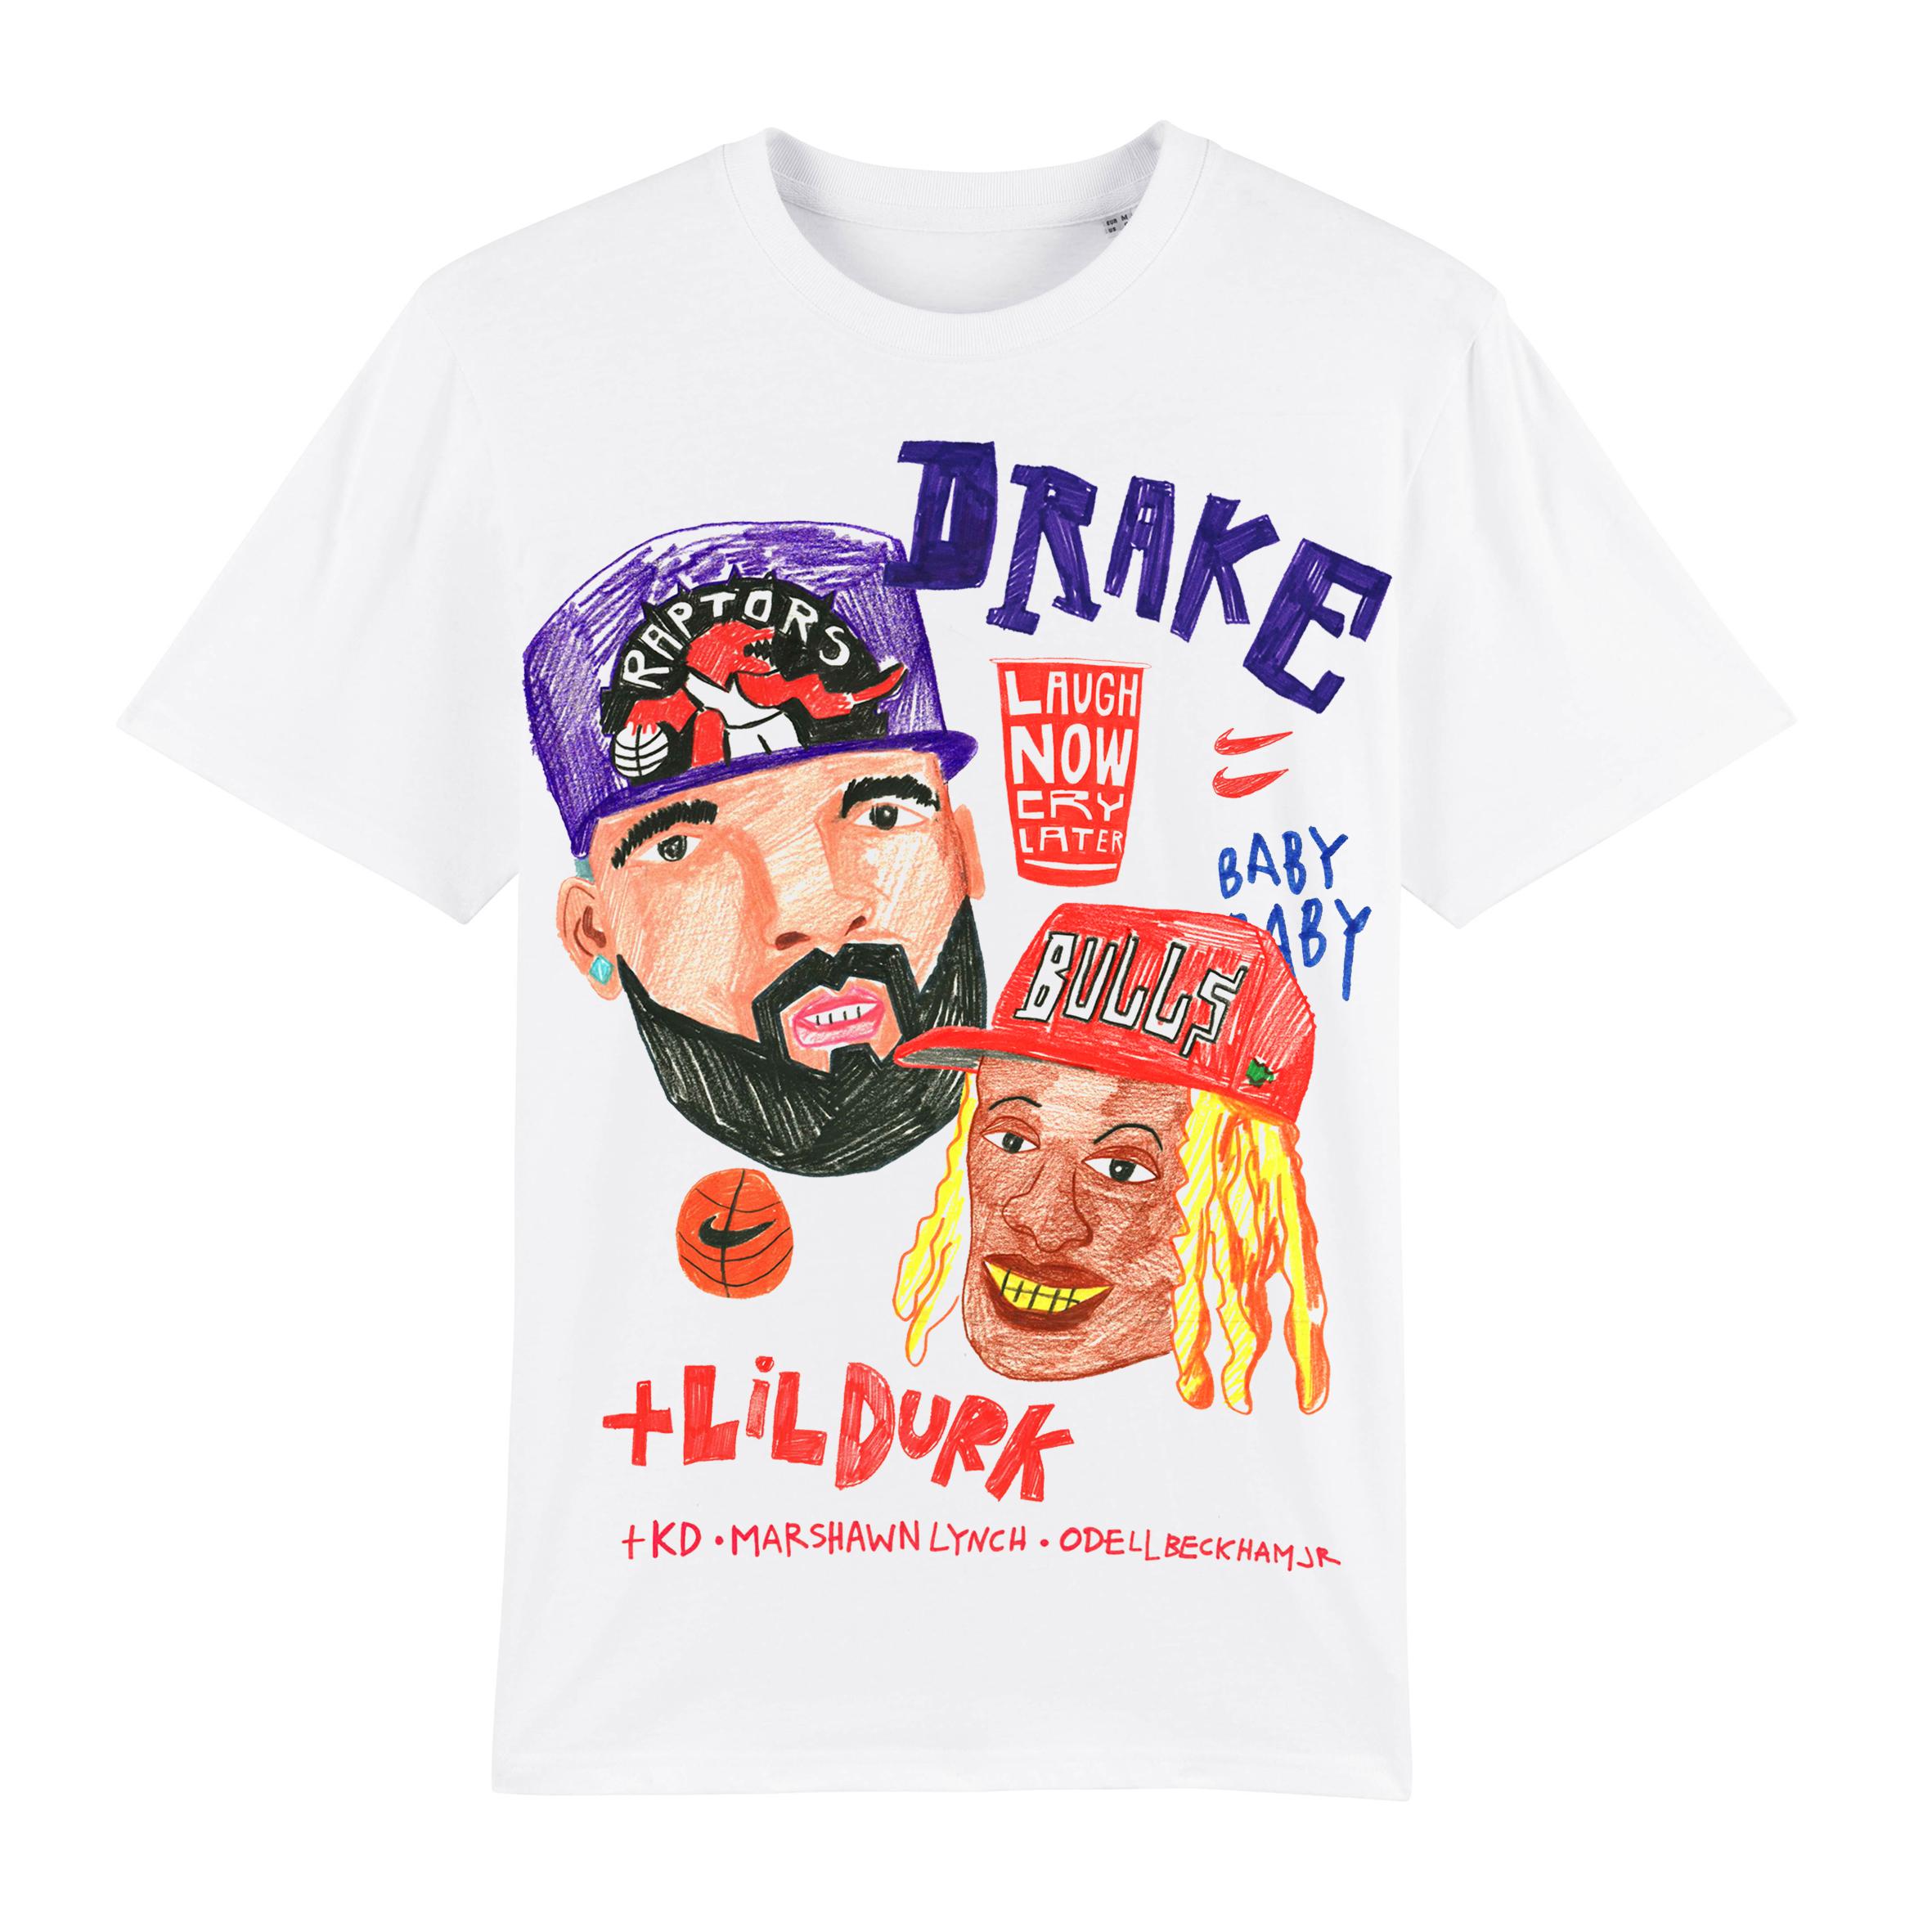 Drake Durk shirt